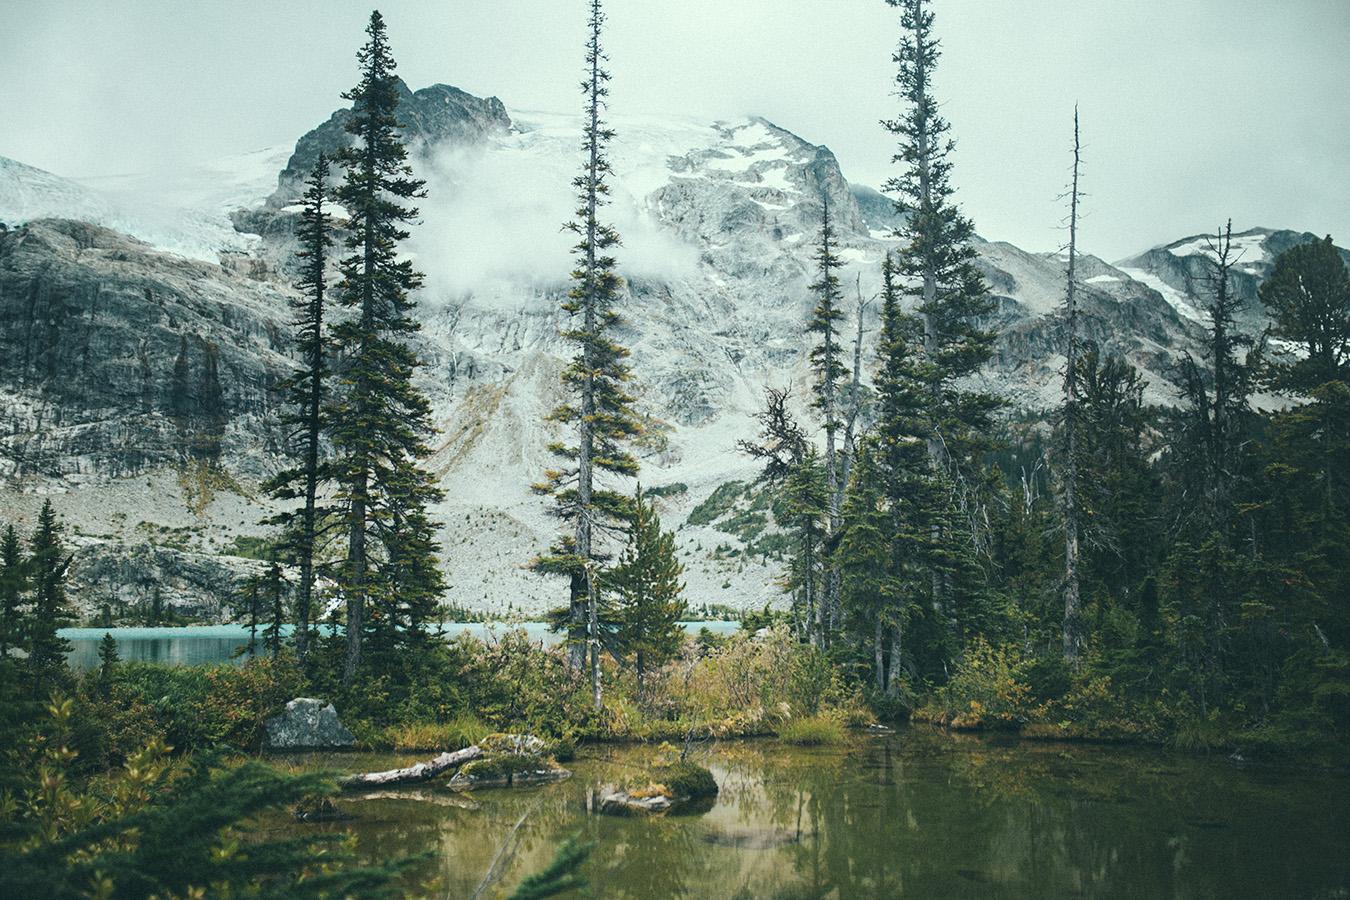 Upper Lake Trail, Joffre Lakes Provincial Park, Kanada